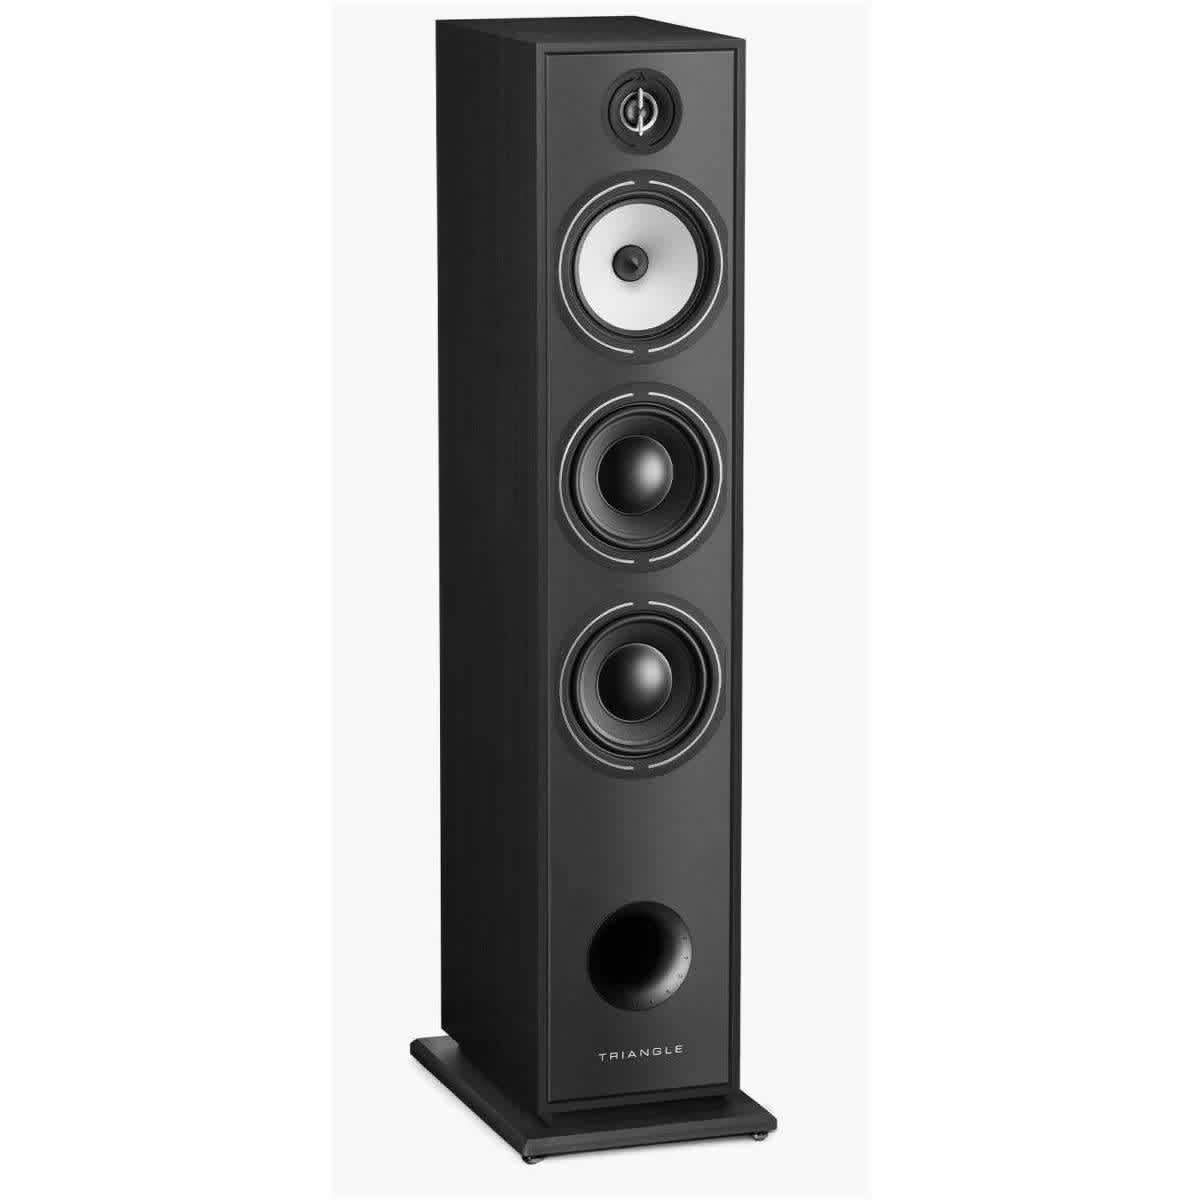 Triangle Speakers Borea BR08 150W HiFi Floor Standing Speaker (Single)